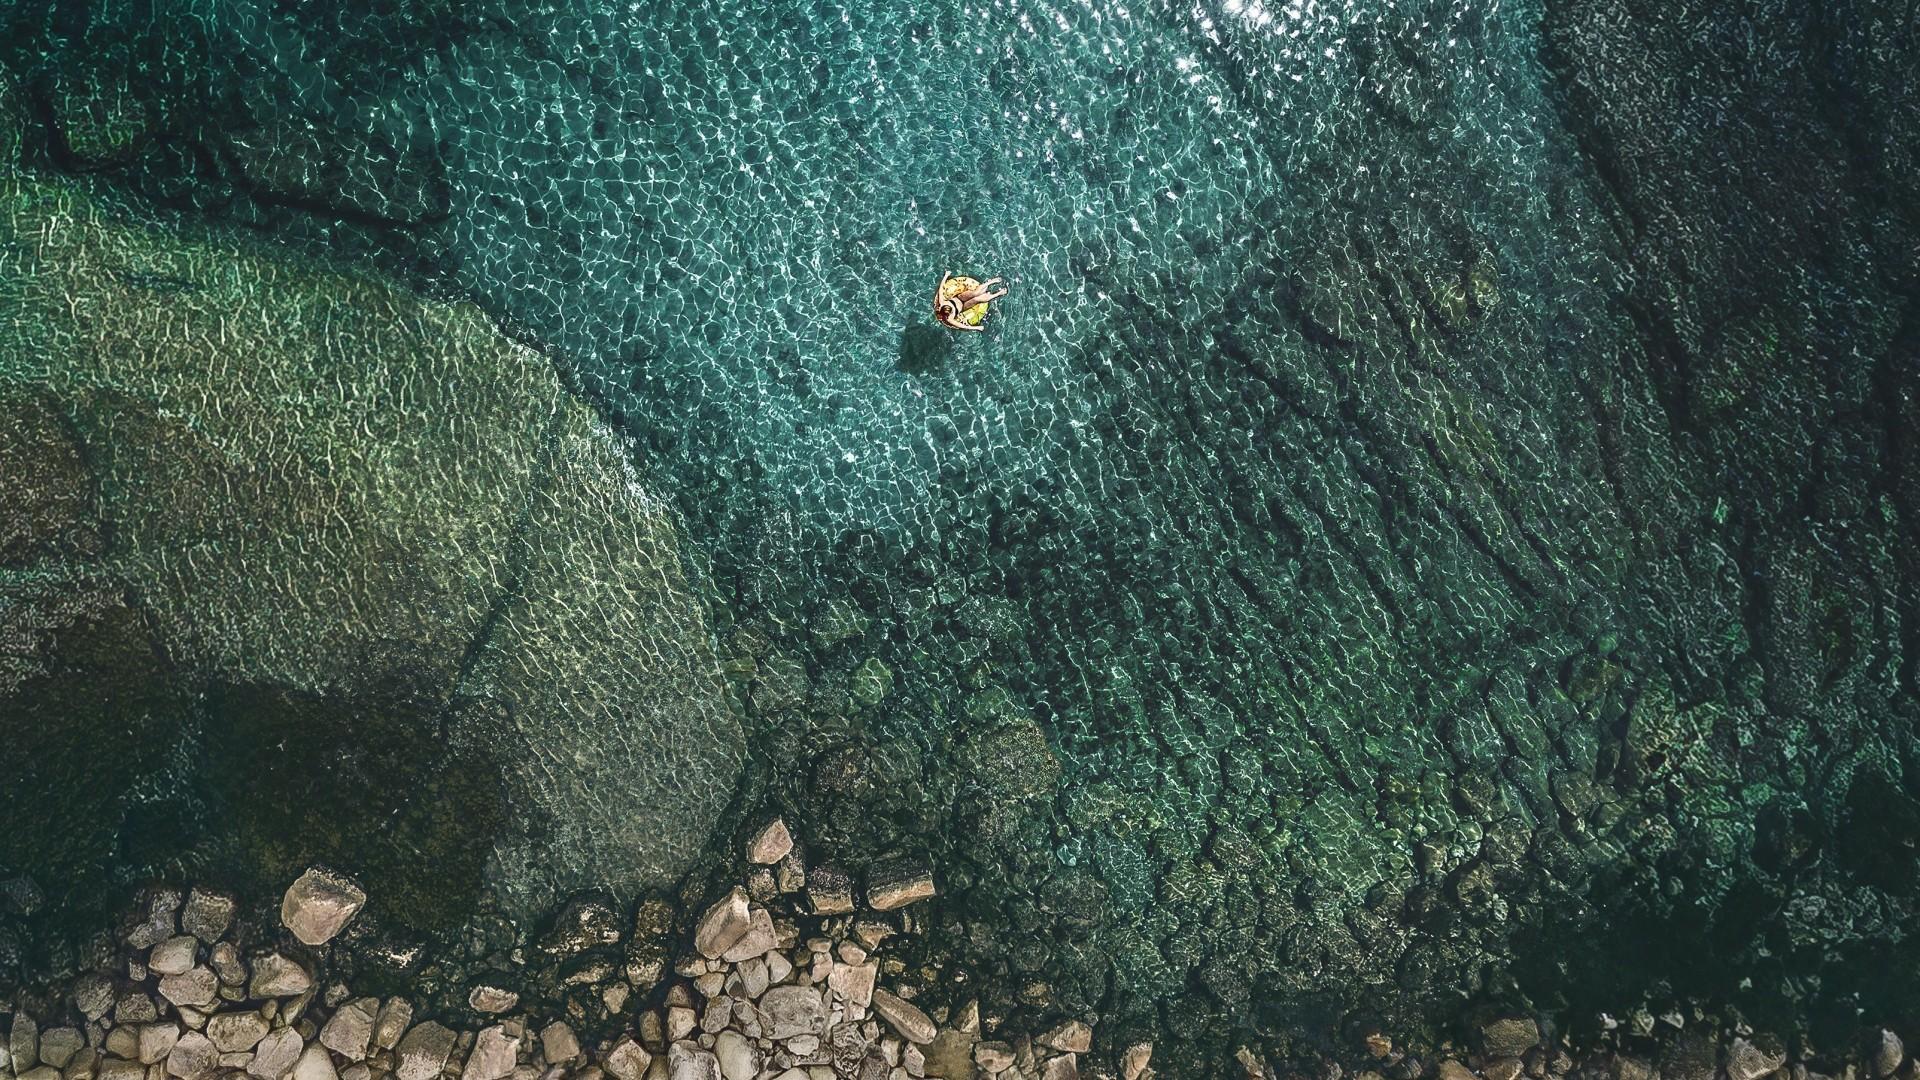 Ios 7 Iphone Wallpaper: Wallpaper IOS 11, 4k, Sea, OS #13659